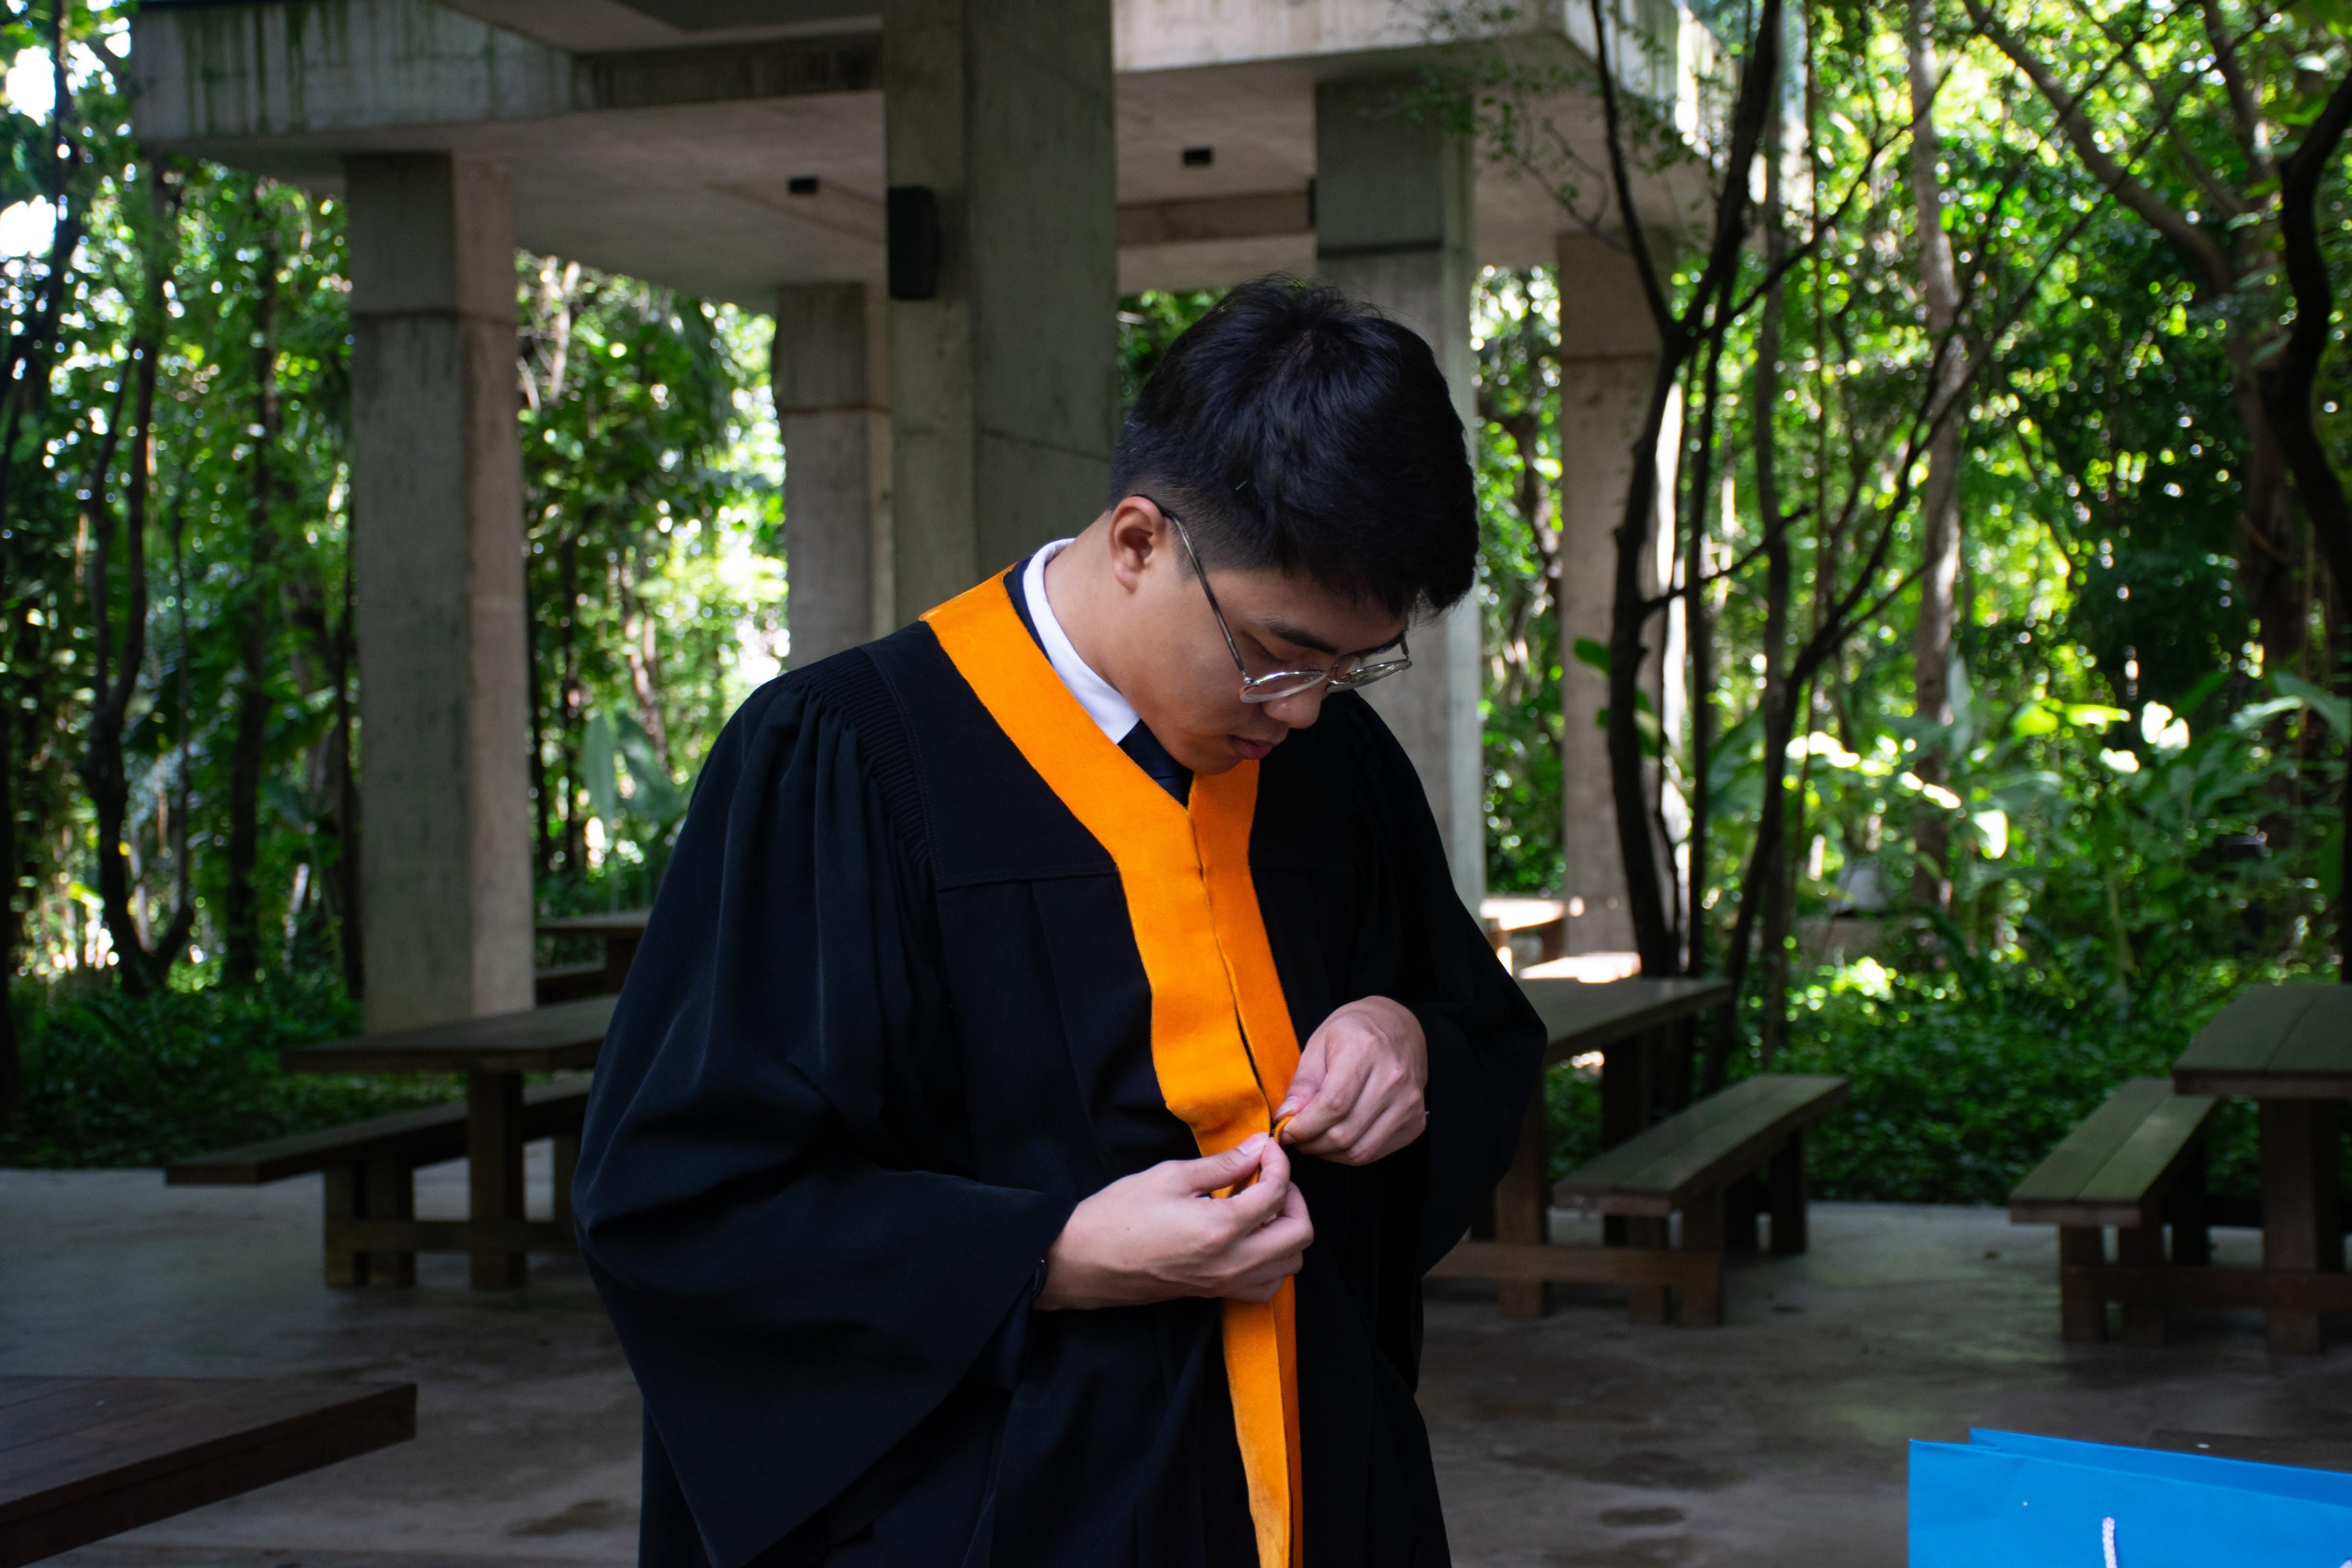 Wearing Graduation Grown